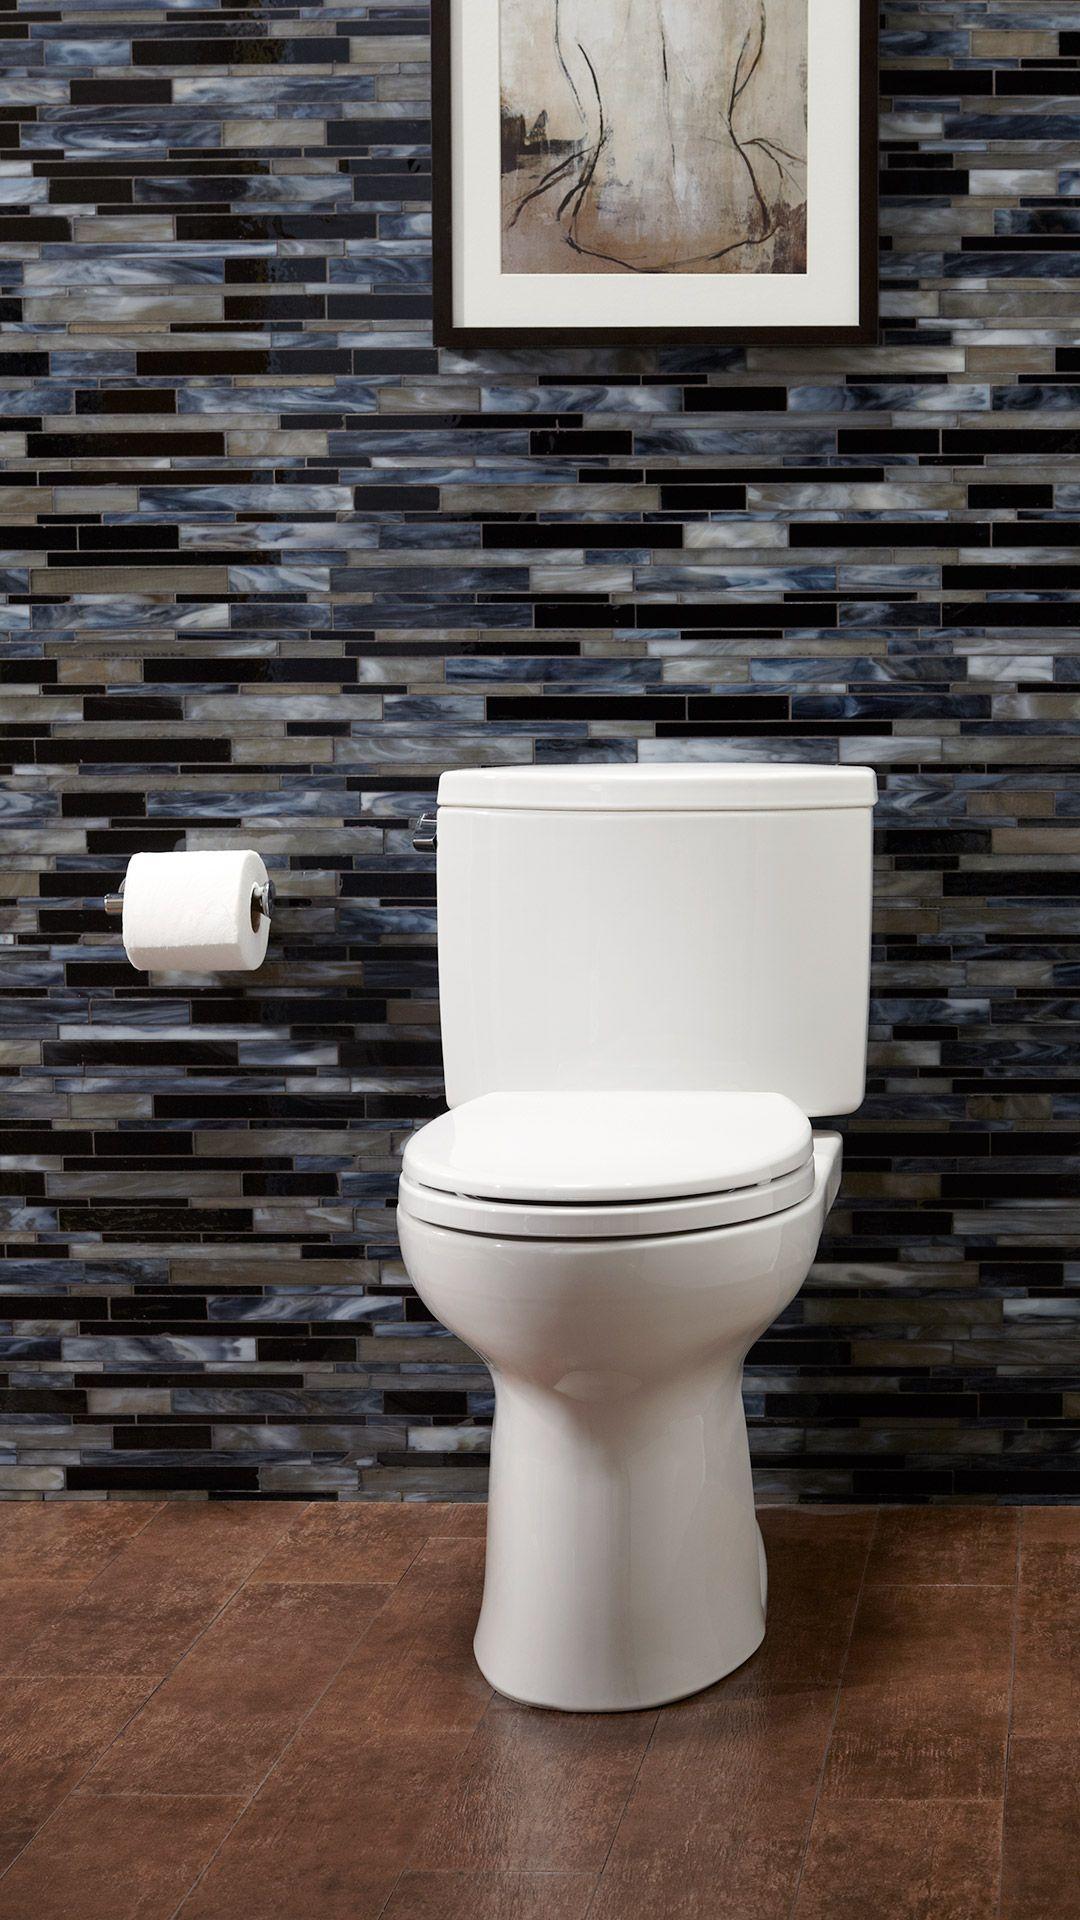 Drake 174 Ii Two Piece Toilet 1 28 Gpf Elongated Bowl